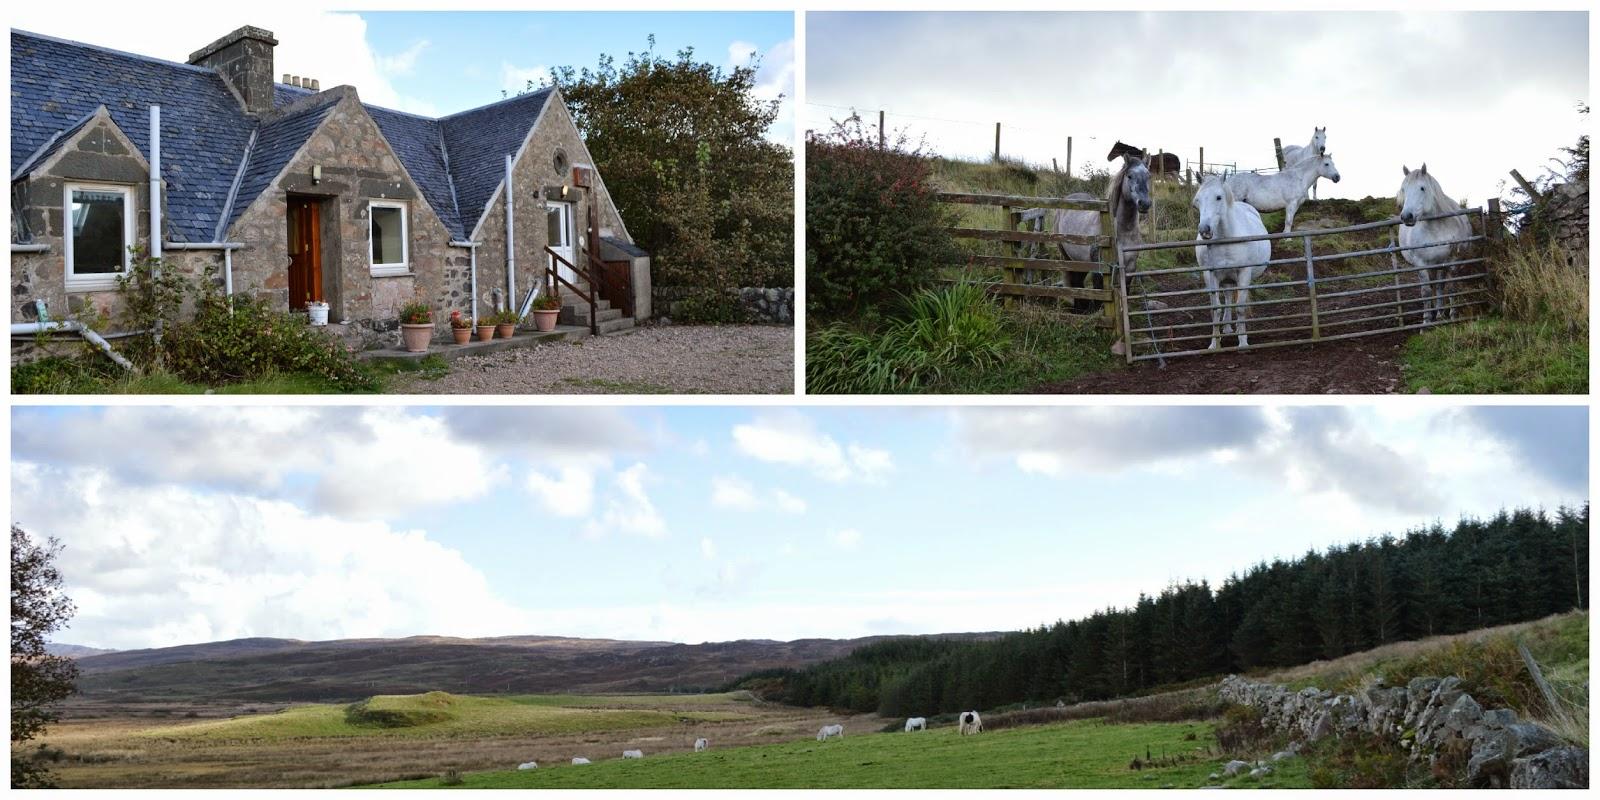 Ballivicar Farms, Isle of Islay, Scotland